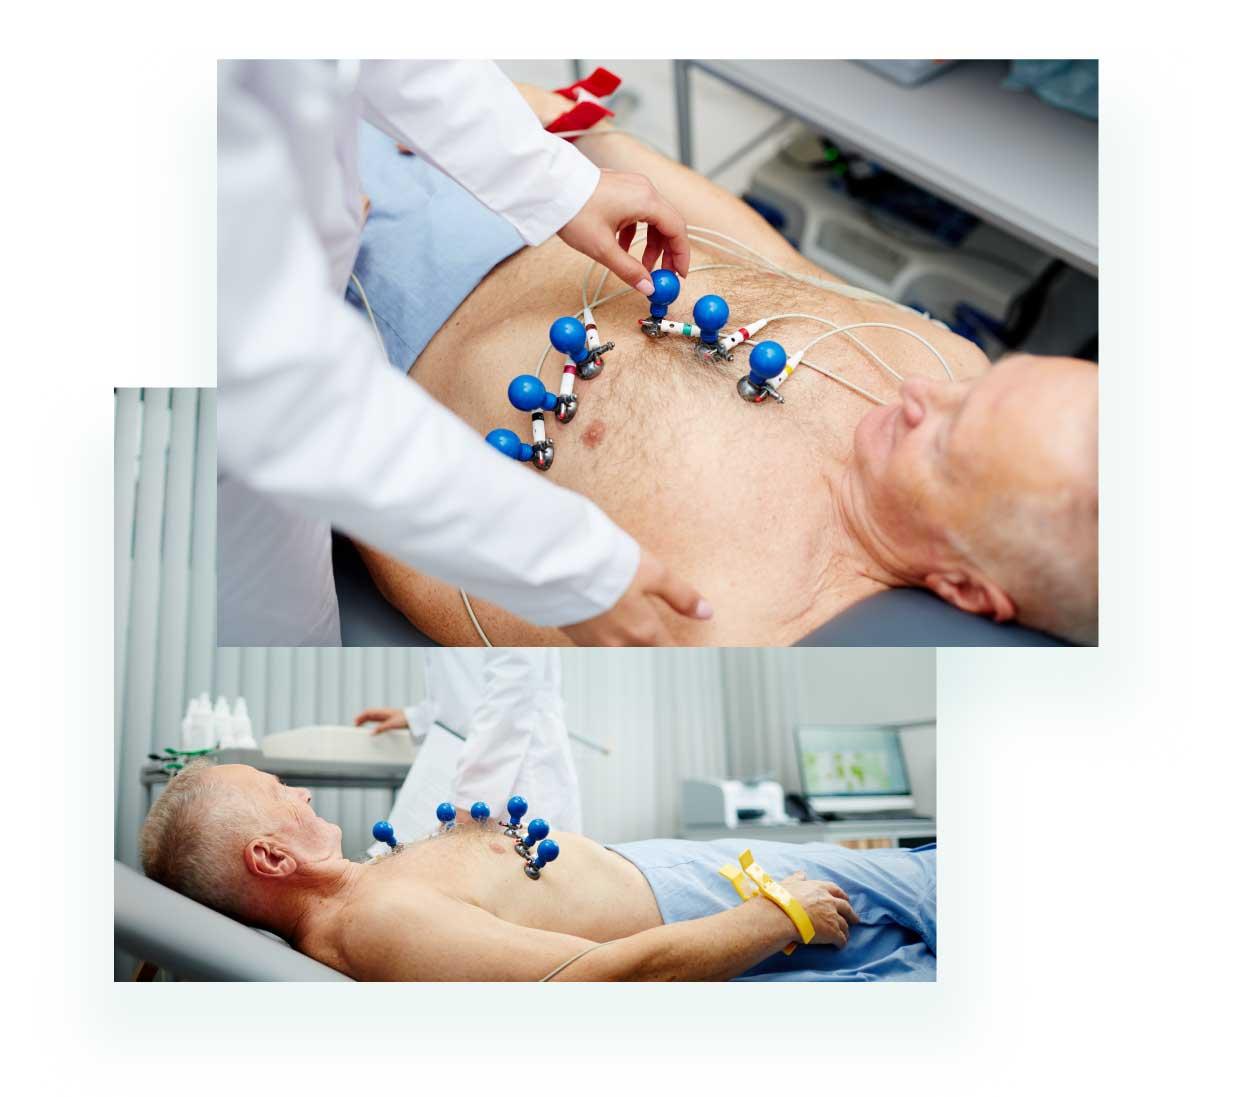 Exame de eletrocardiograma sendo realizado. Laudo de eletrocardiograma.